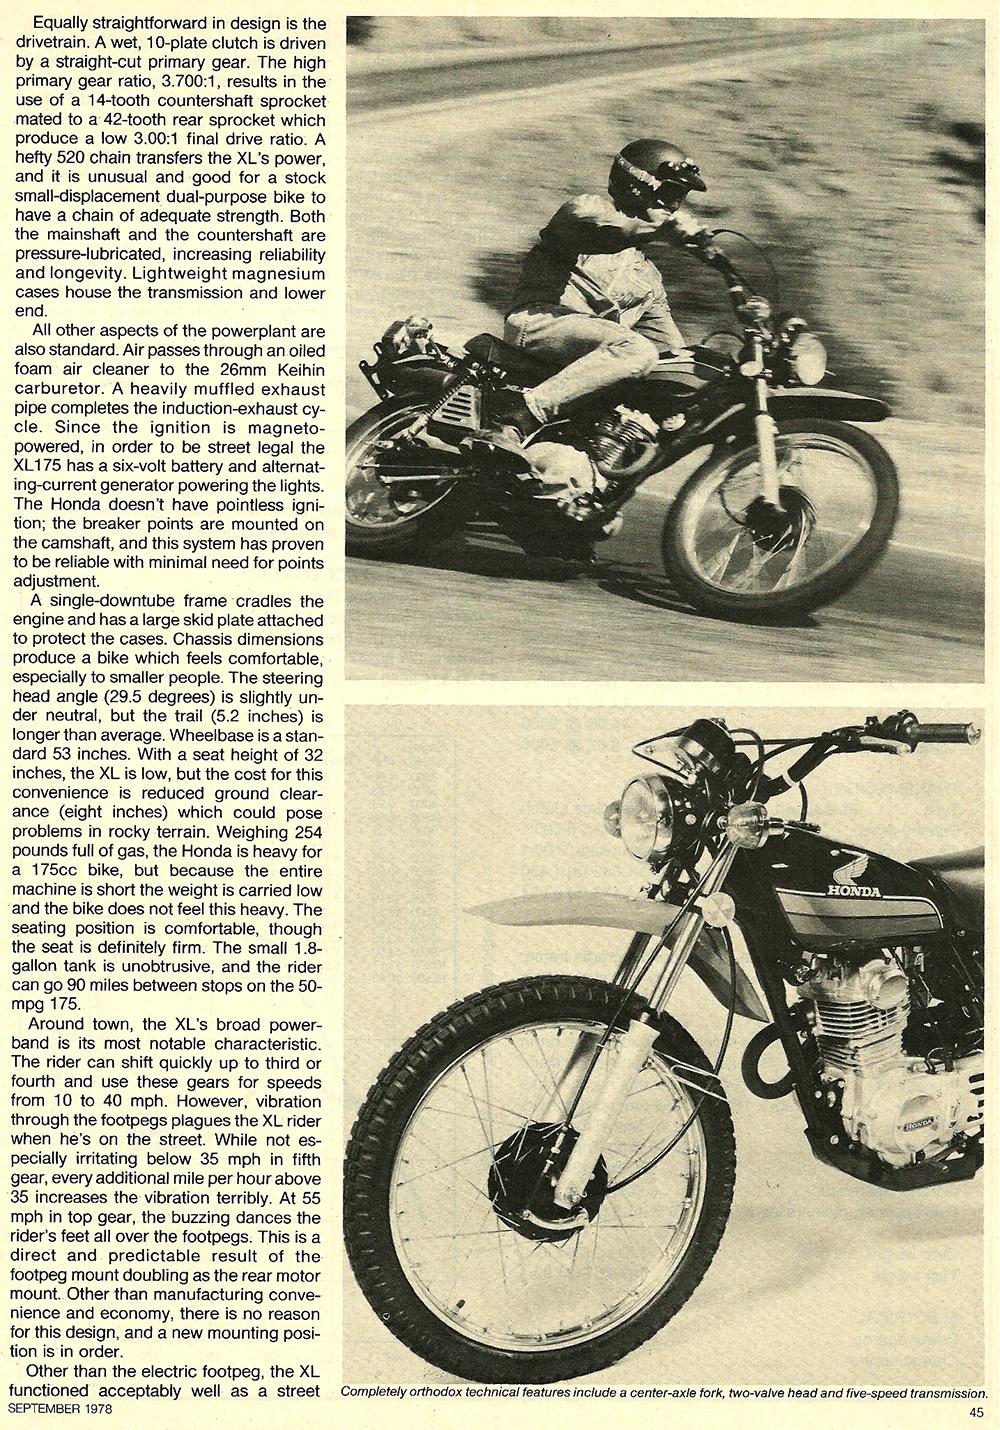 1978 Honda XL175 road test 03.jpg